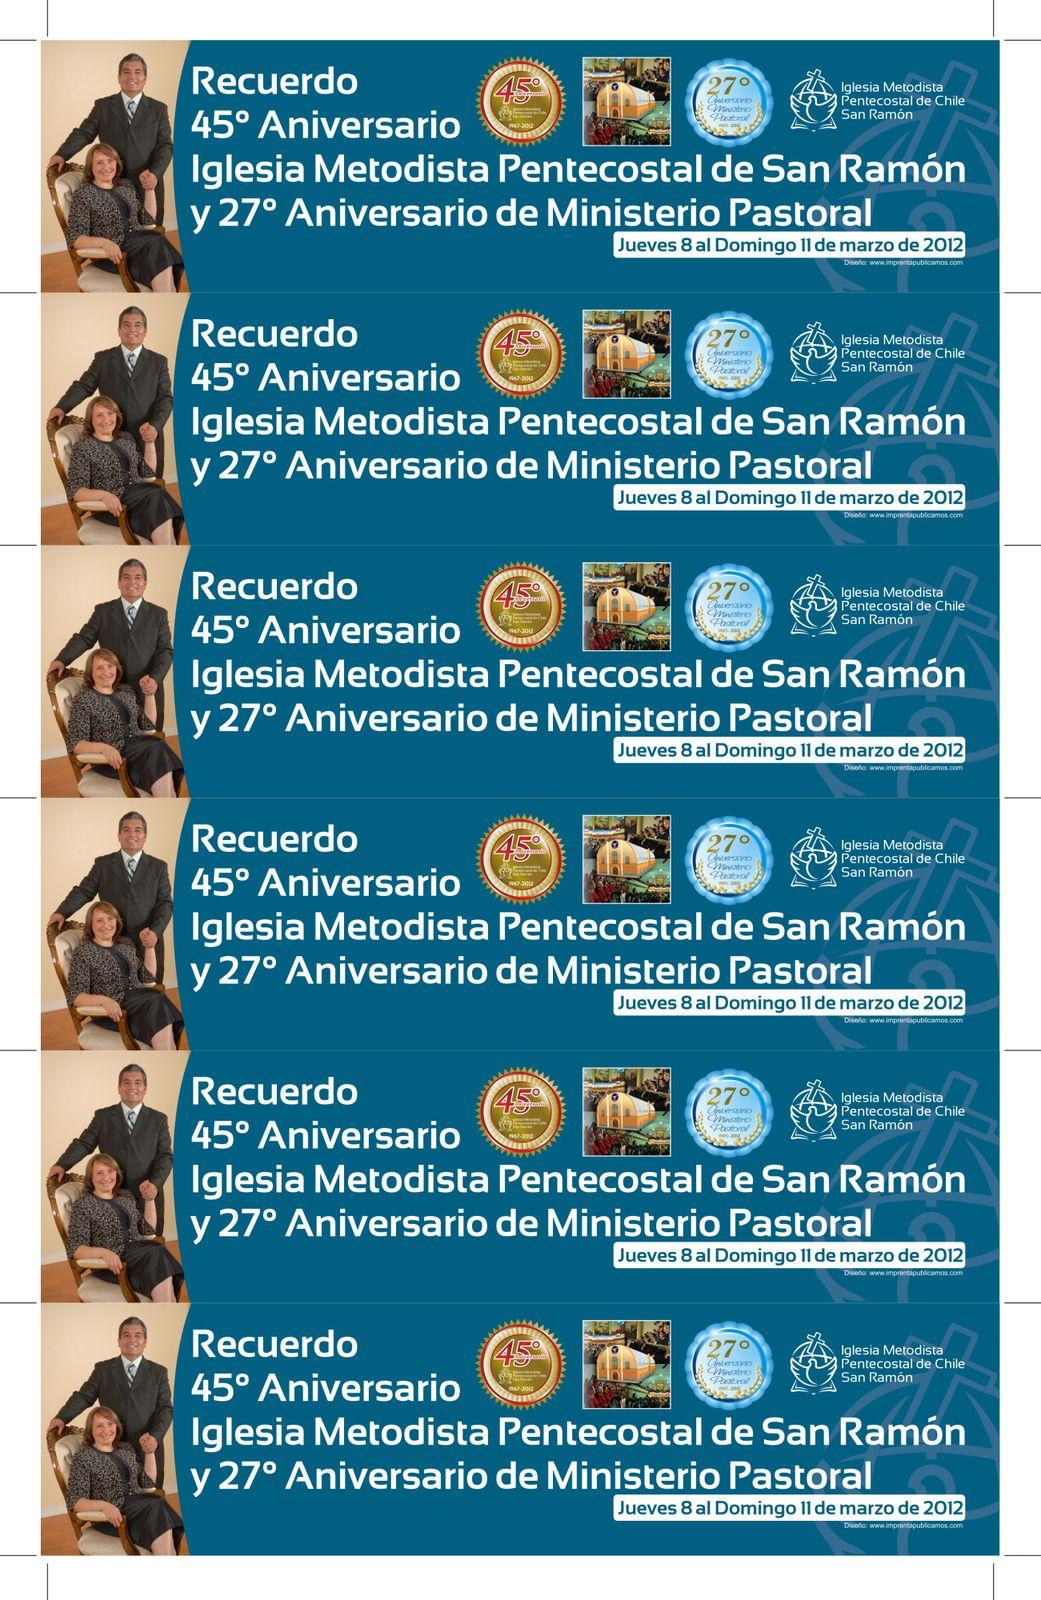 Marcadores de Libro, Separadores de Libro  Impresos Todo Color  Imprenta Publicamos / Chile imprentapublicamos@gmail.com